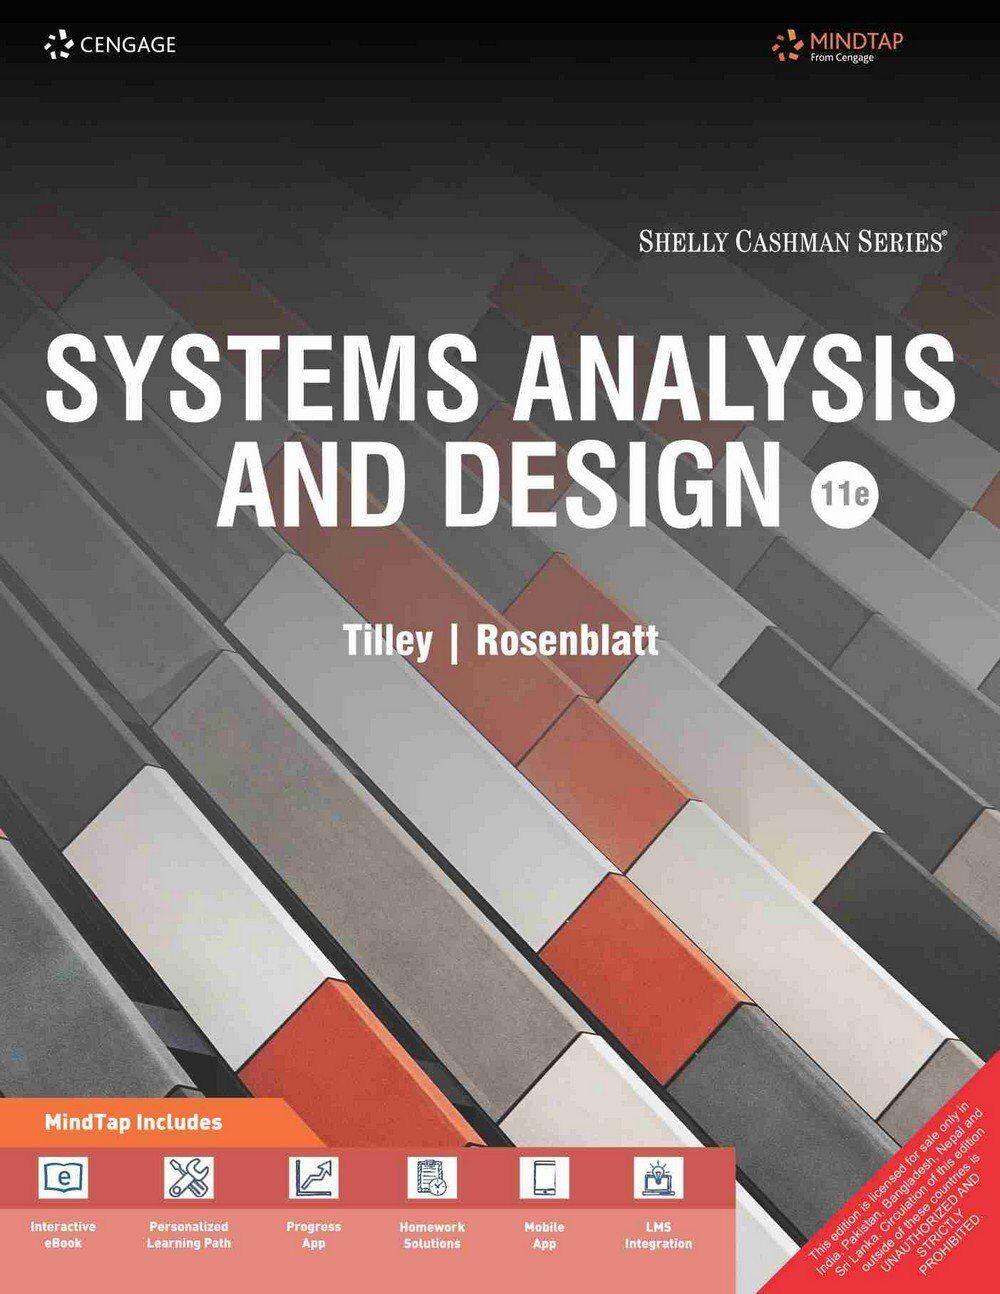 Systems analysis and design by harry j rosenblatt and scott tilley resntentobalflowflowcomponentncel fandeluxe Images